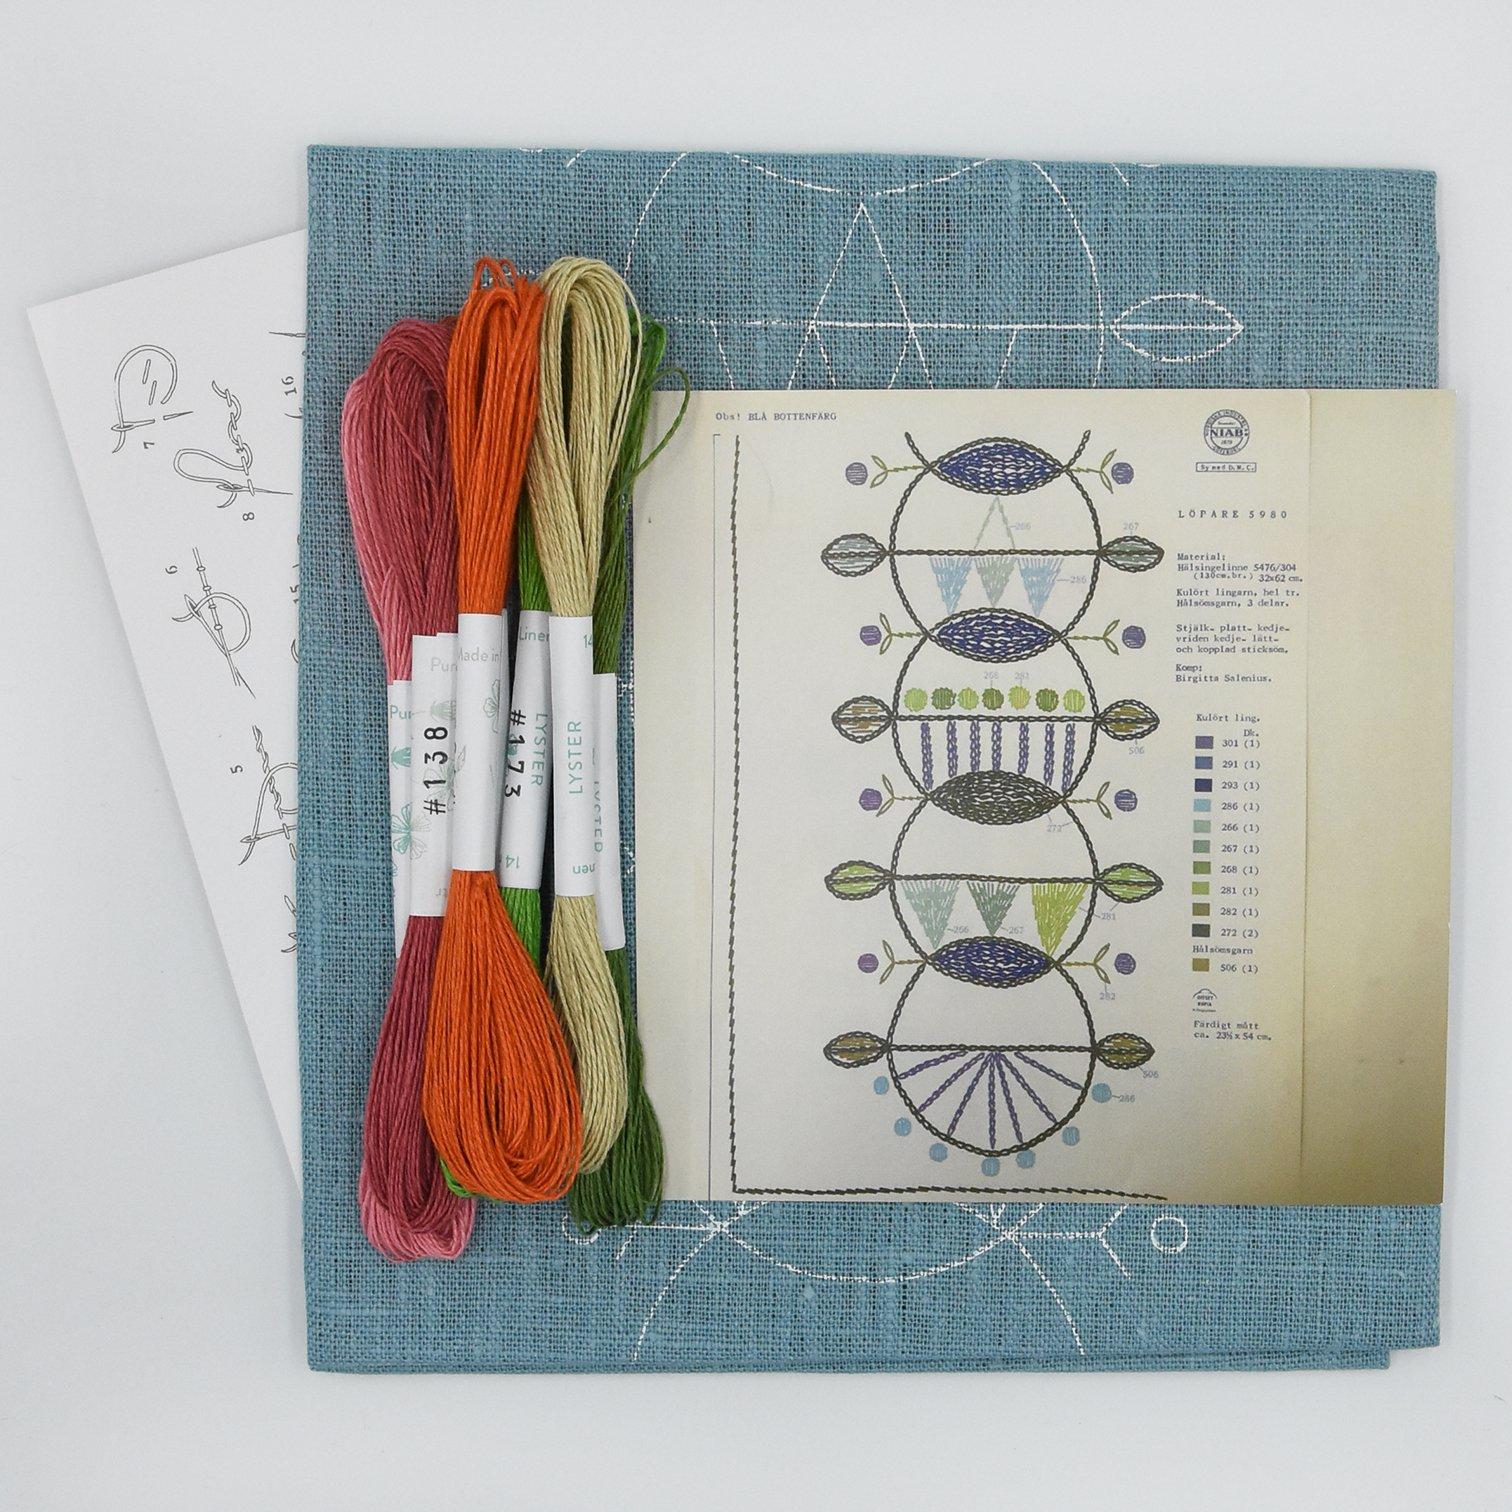 Linladan - Circle Chain 5980 - Swedish Embroidery Kit 31